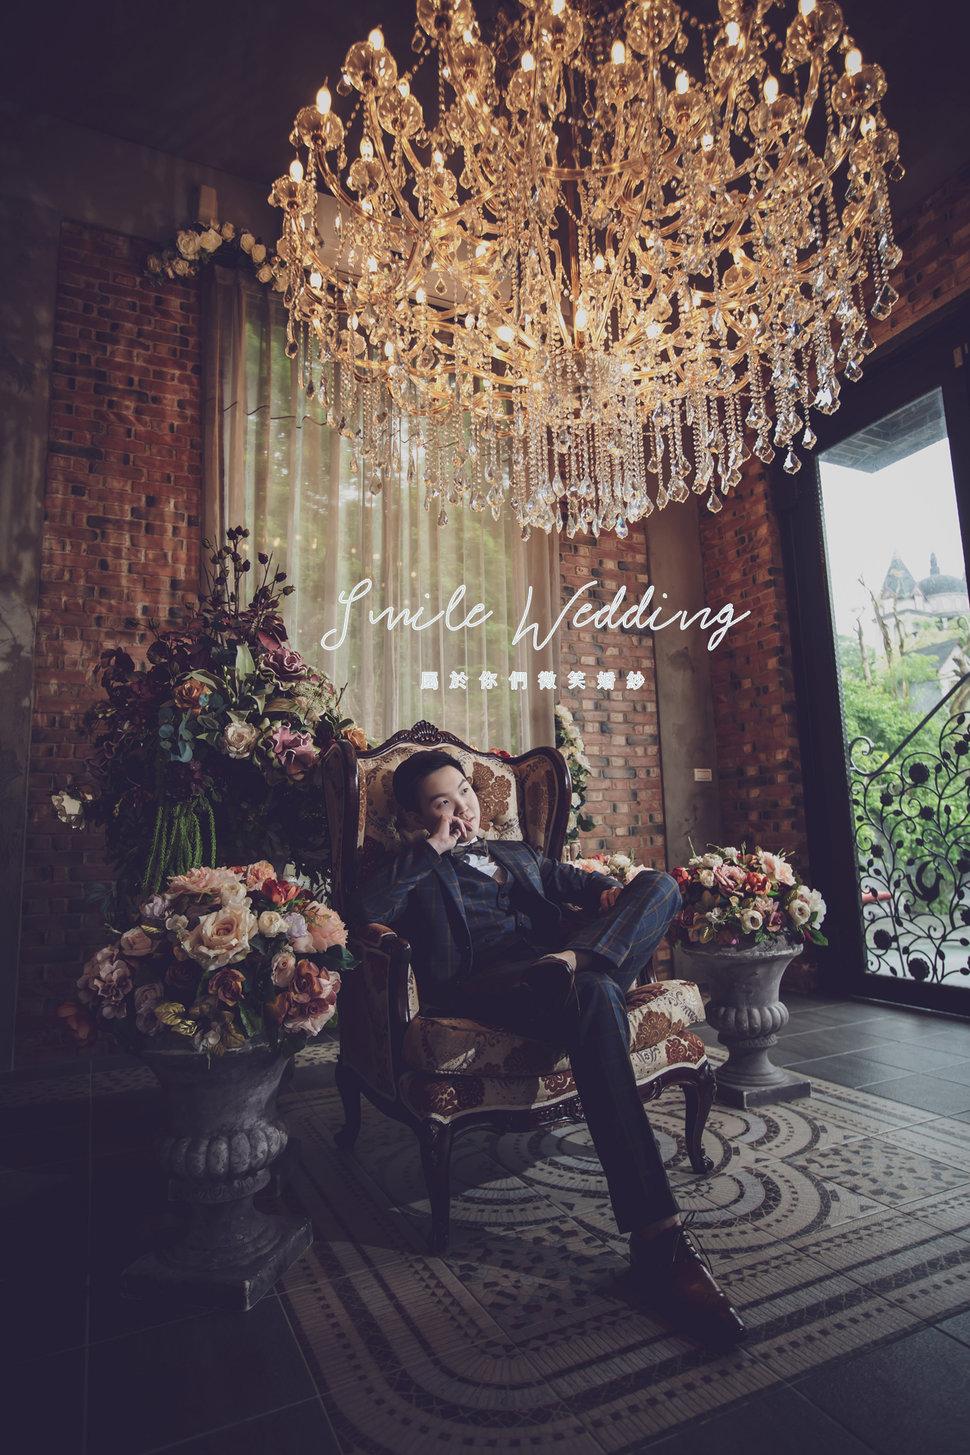 SIN_8447 - Smile wedding 微笑婚紗《結婚吧》